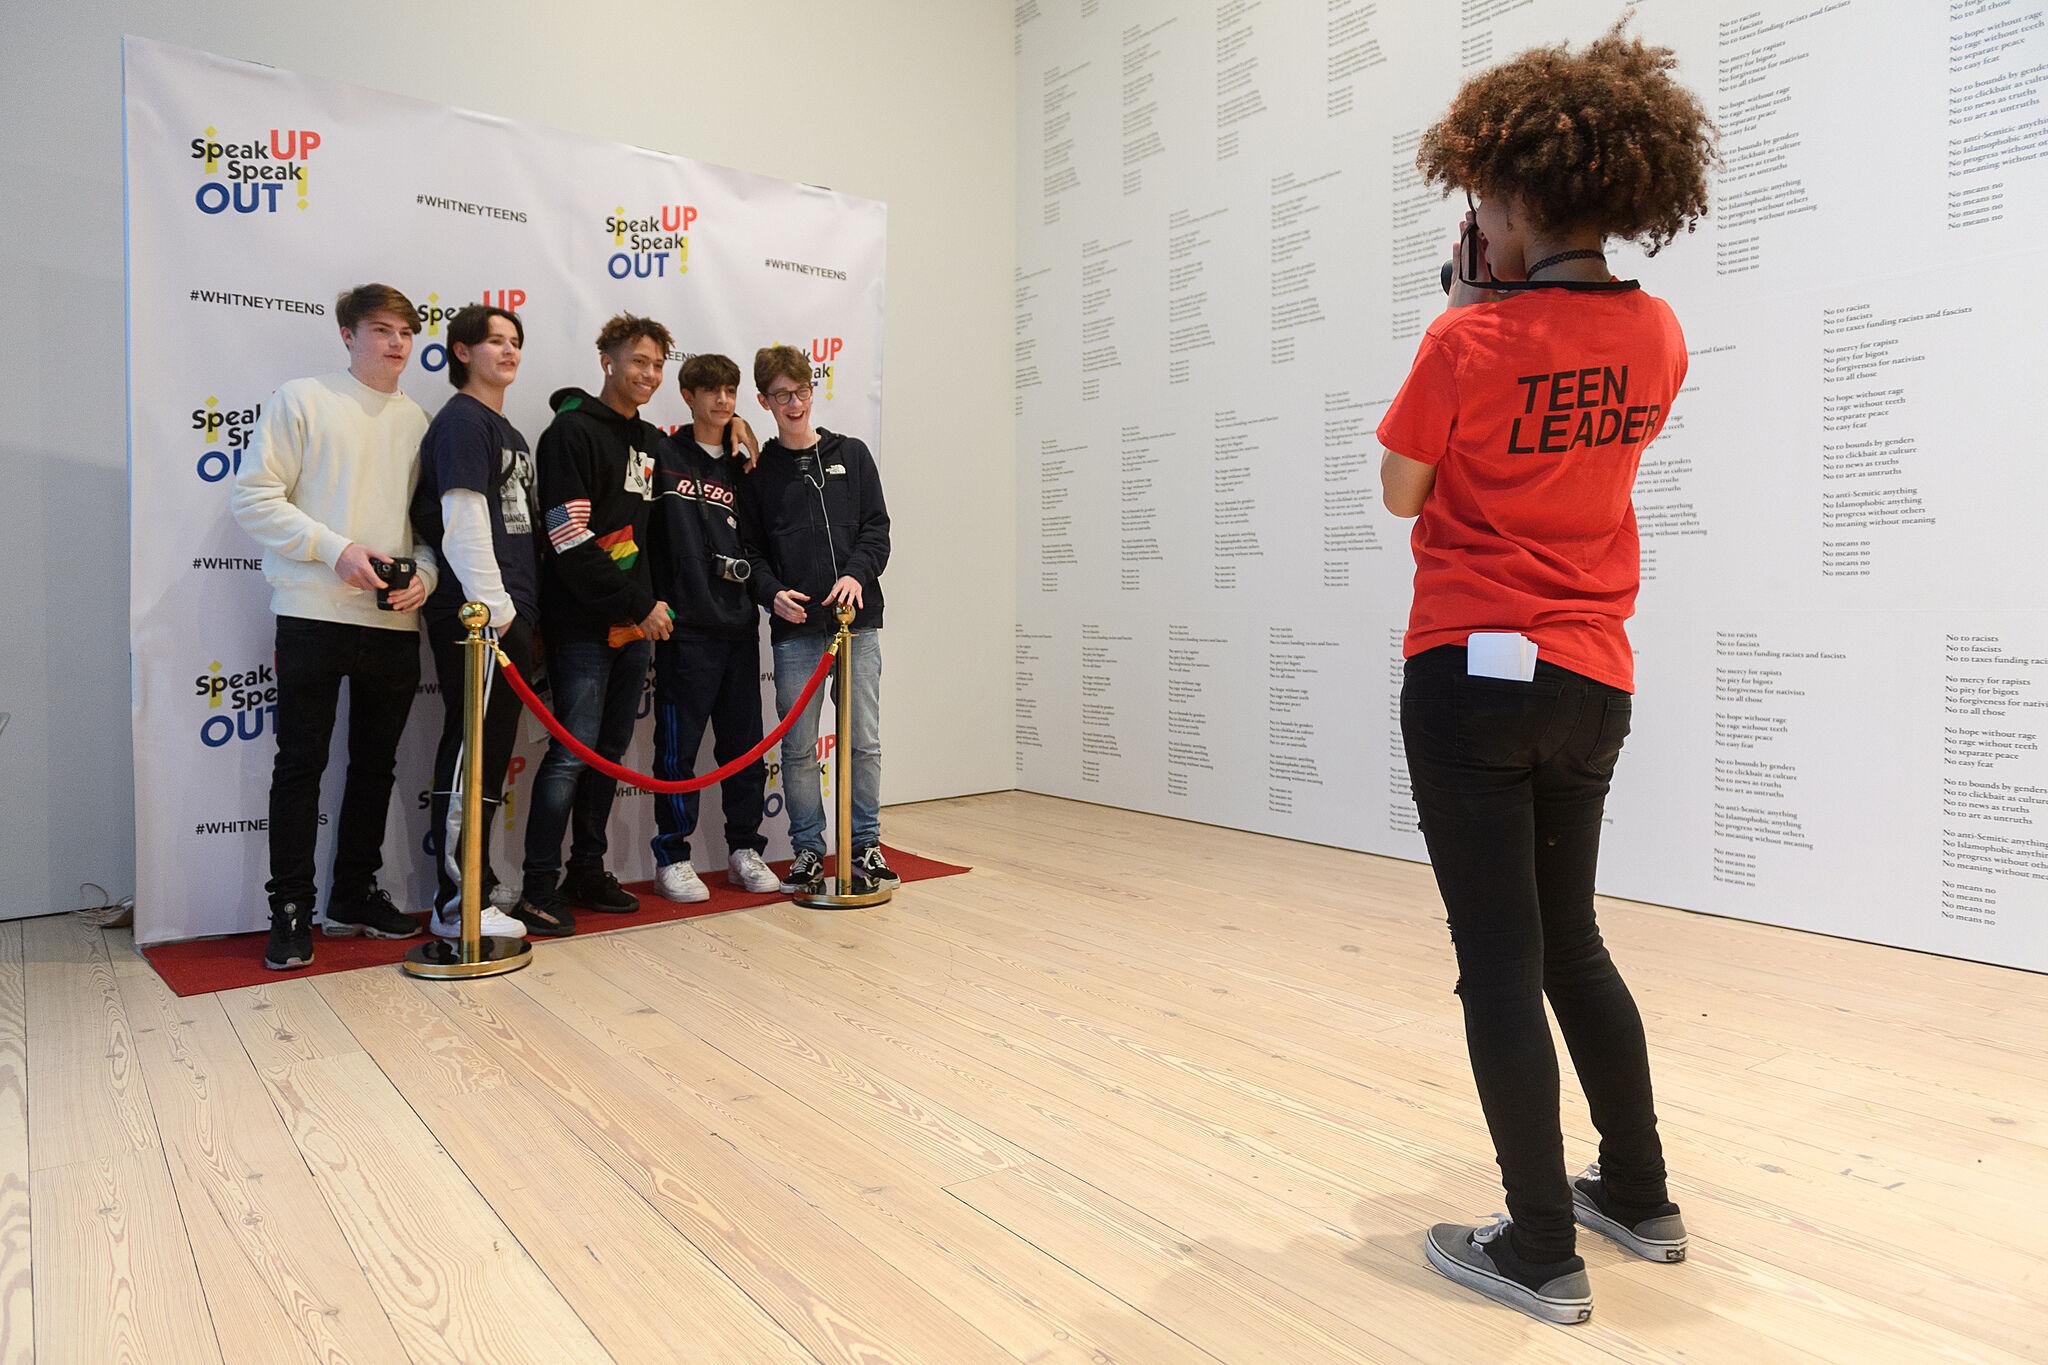 Teens posing for photograph.